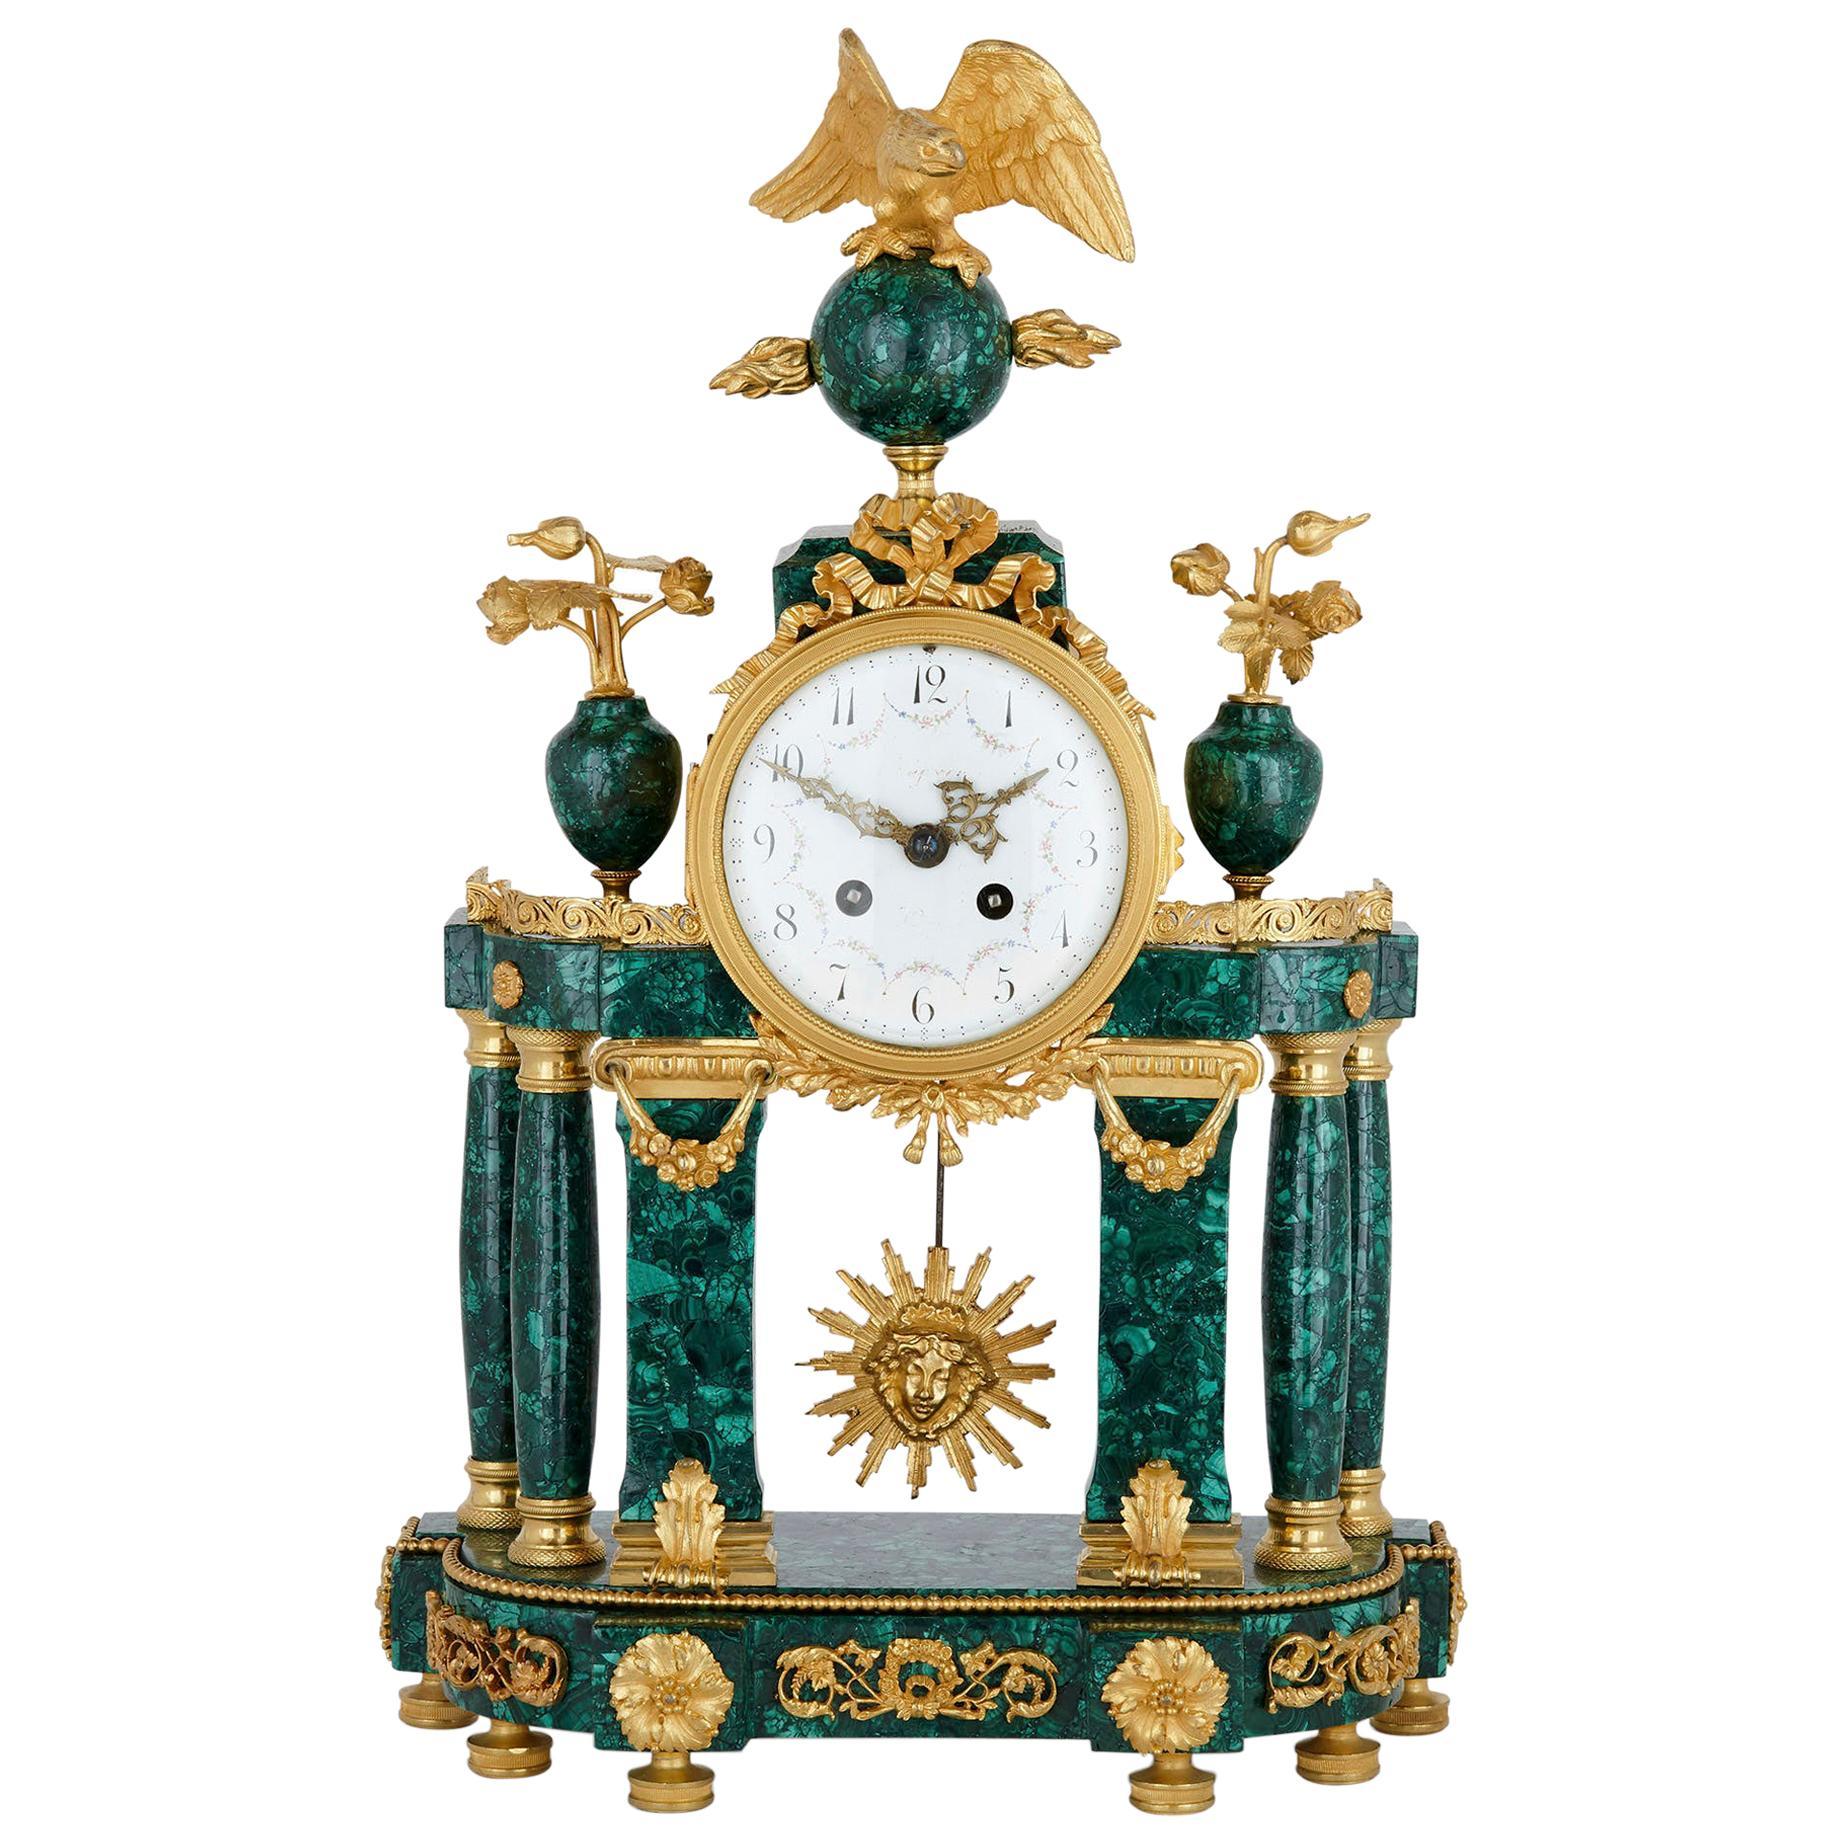 Neoclassical Style French Malachite and Gilt Bronze Mantel Clock